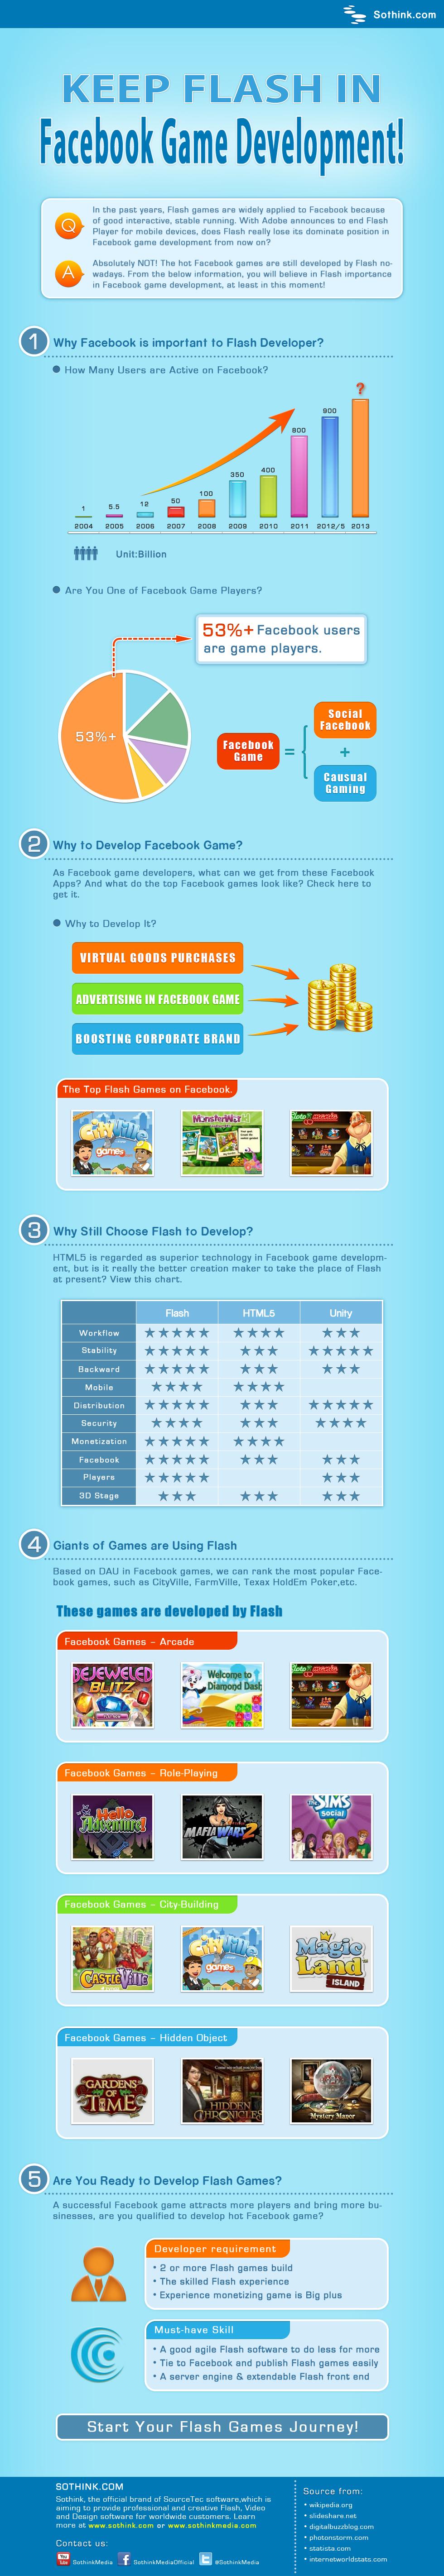 Keep Flash in Facebook Game Development!